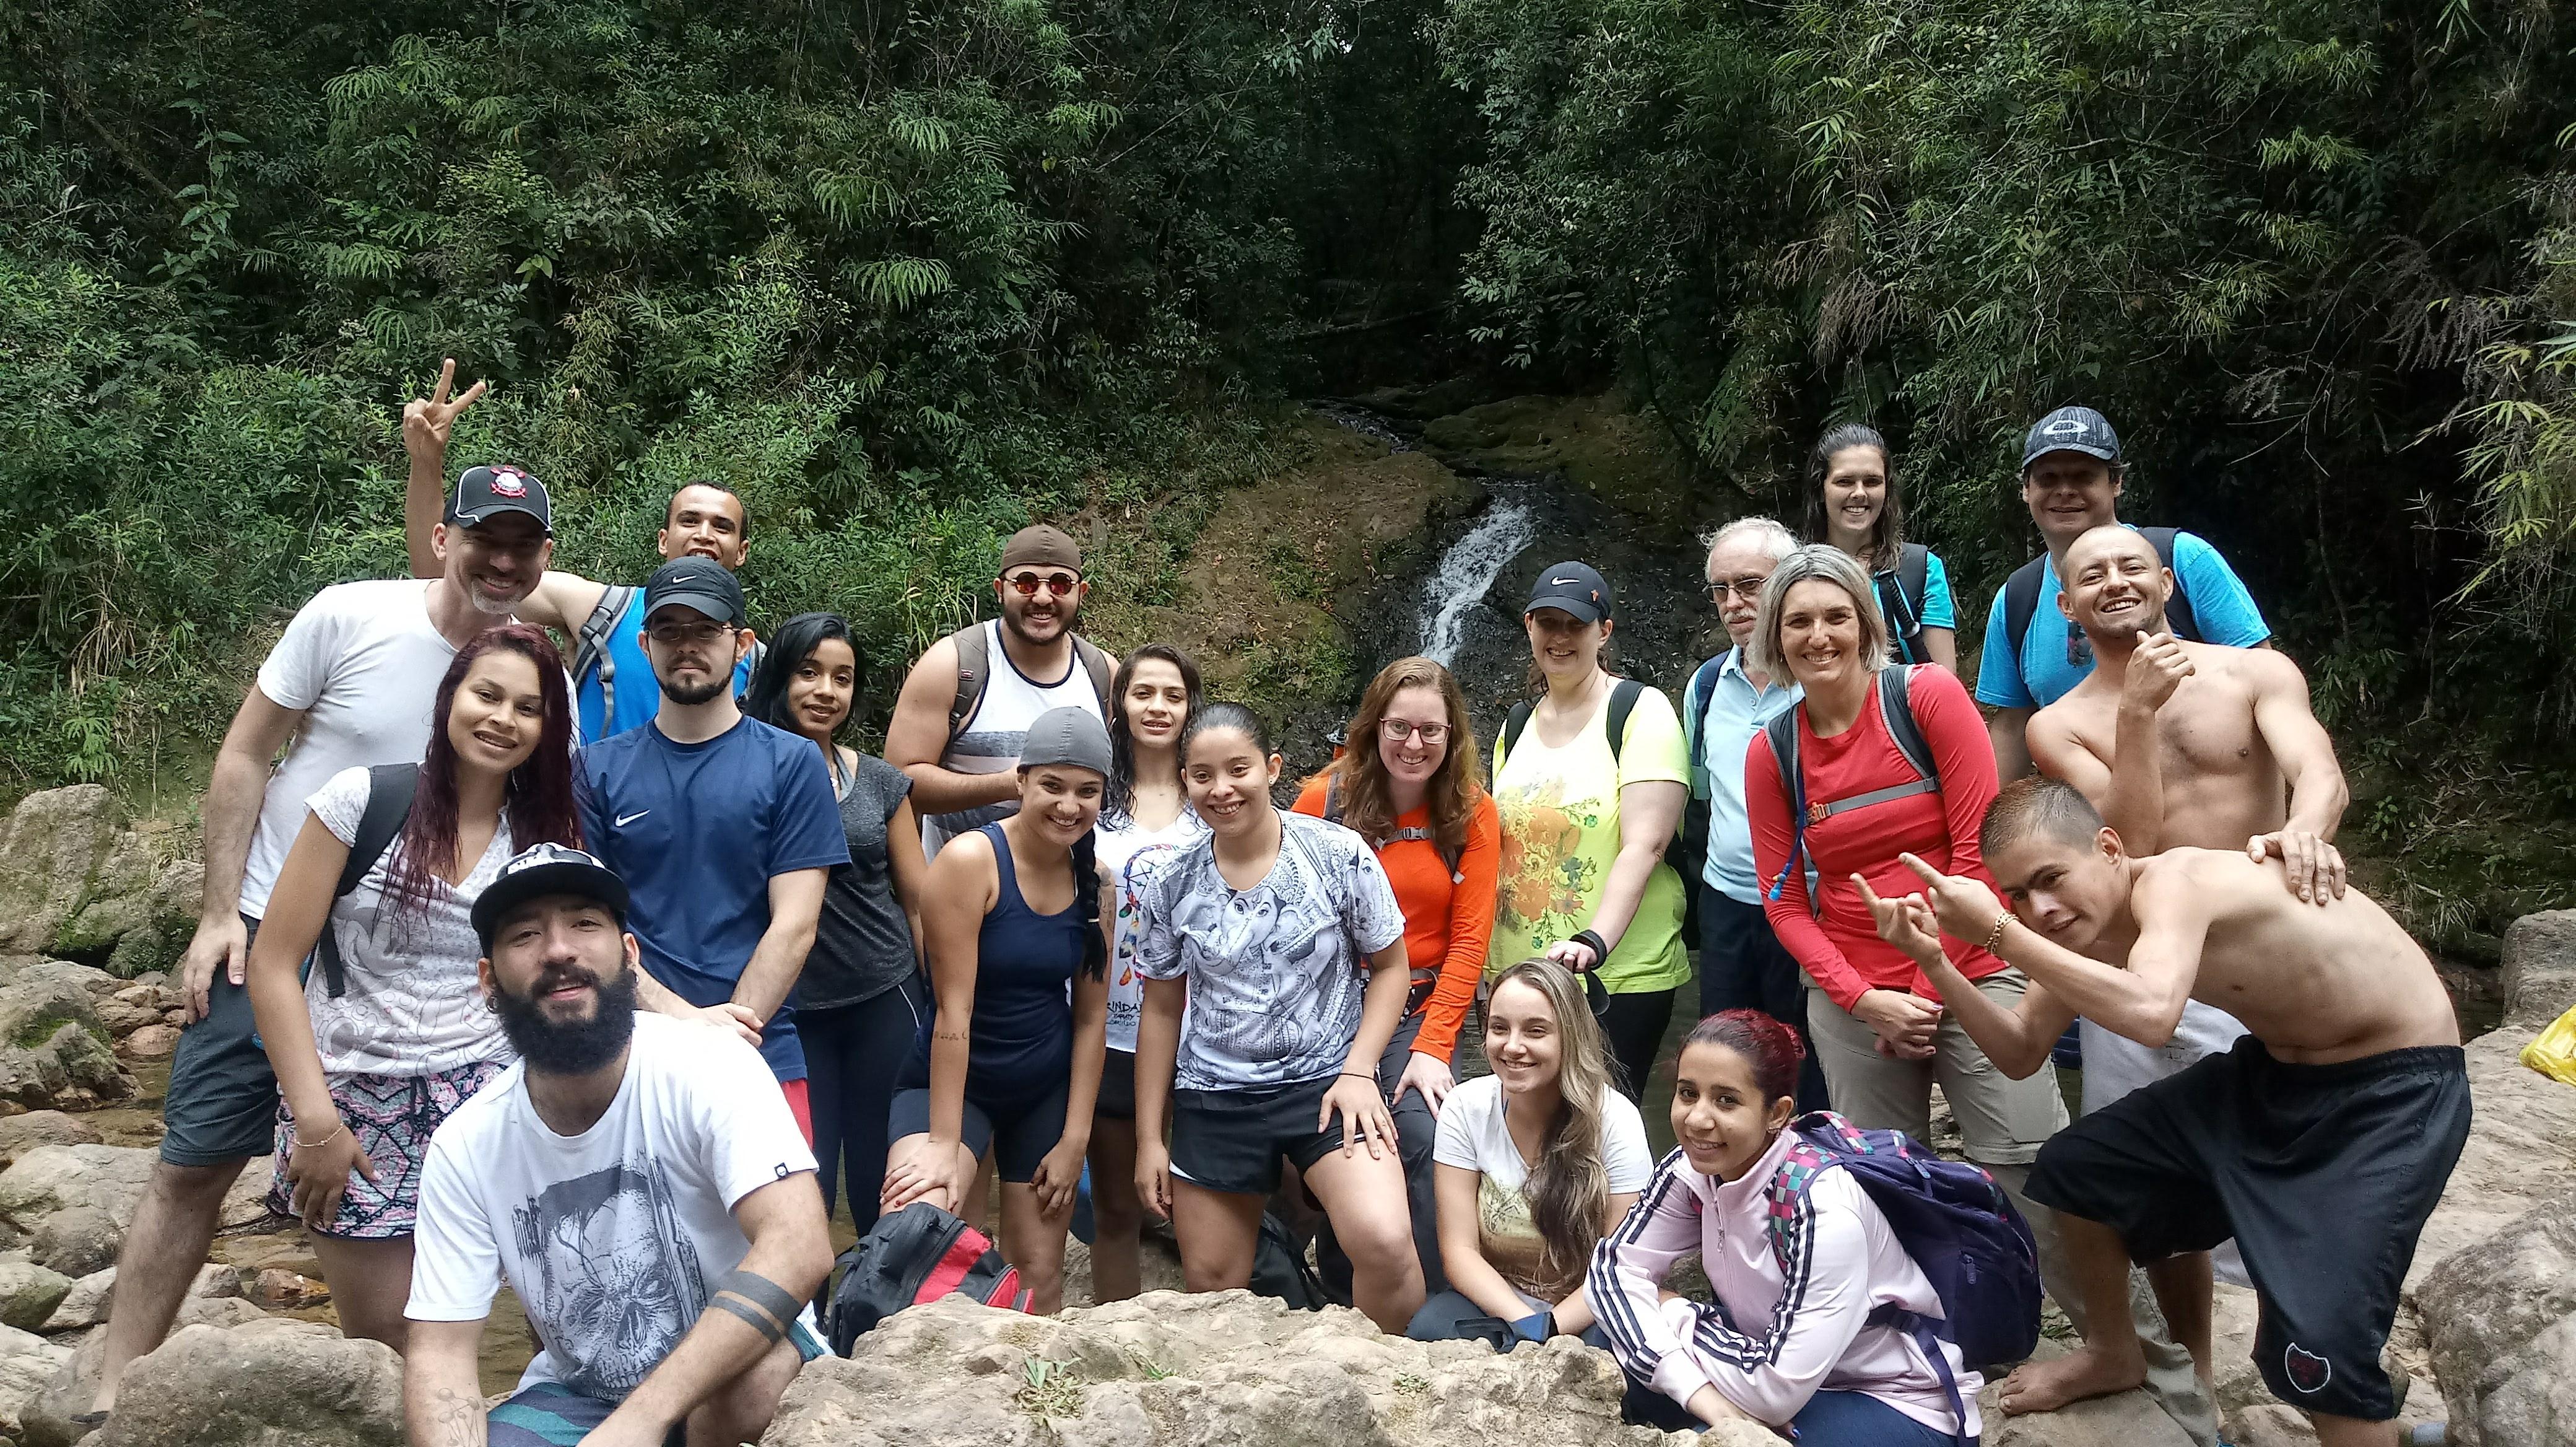 Cachoeira_Poço_das_Virgens_-_Free_23092017